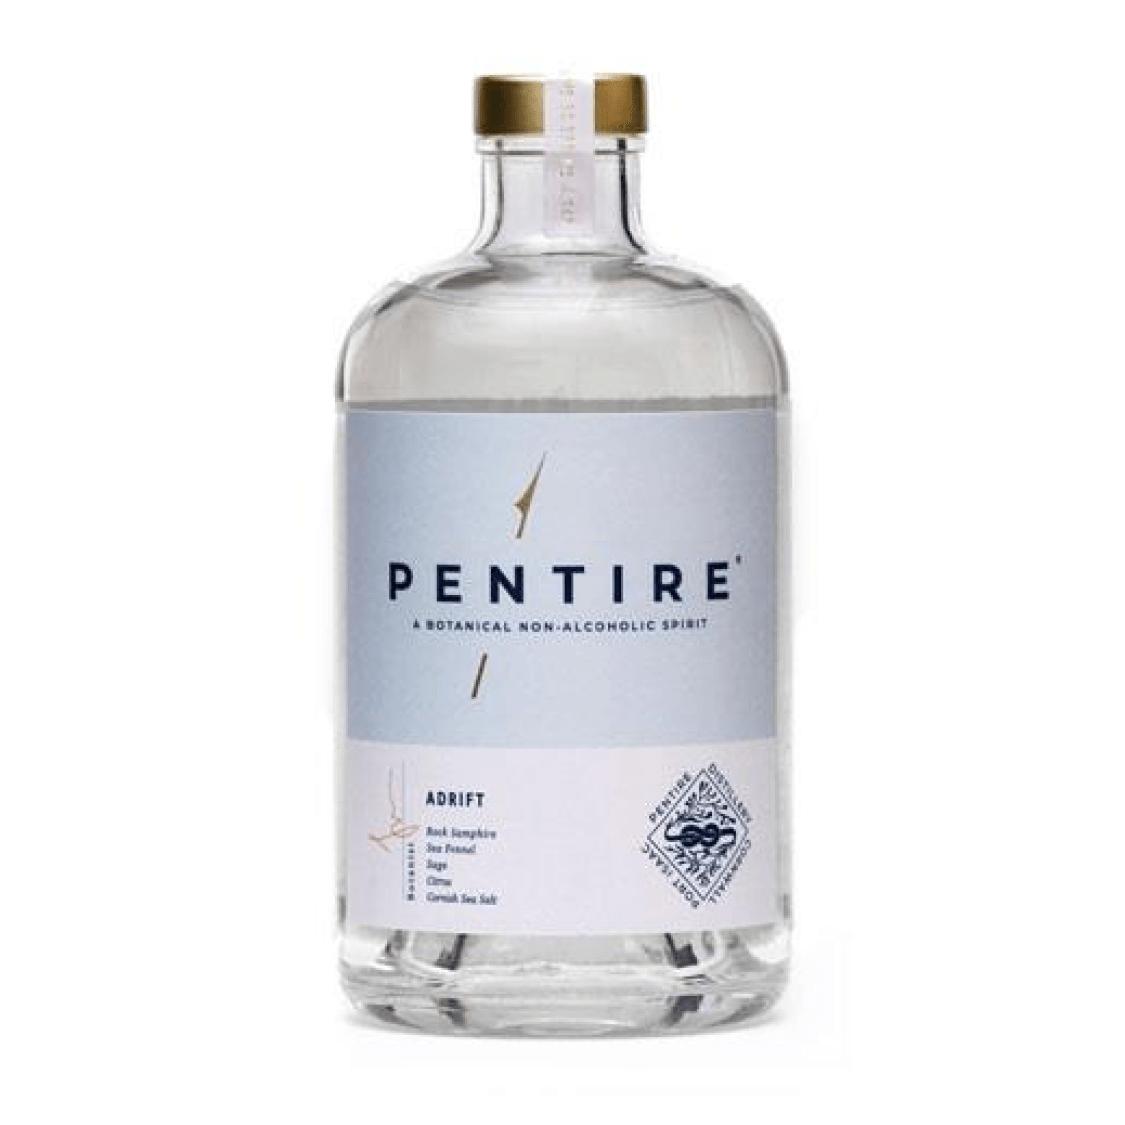 Pentire Adrift - Shop The Bar - Female Original